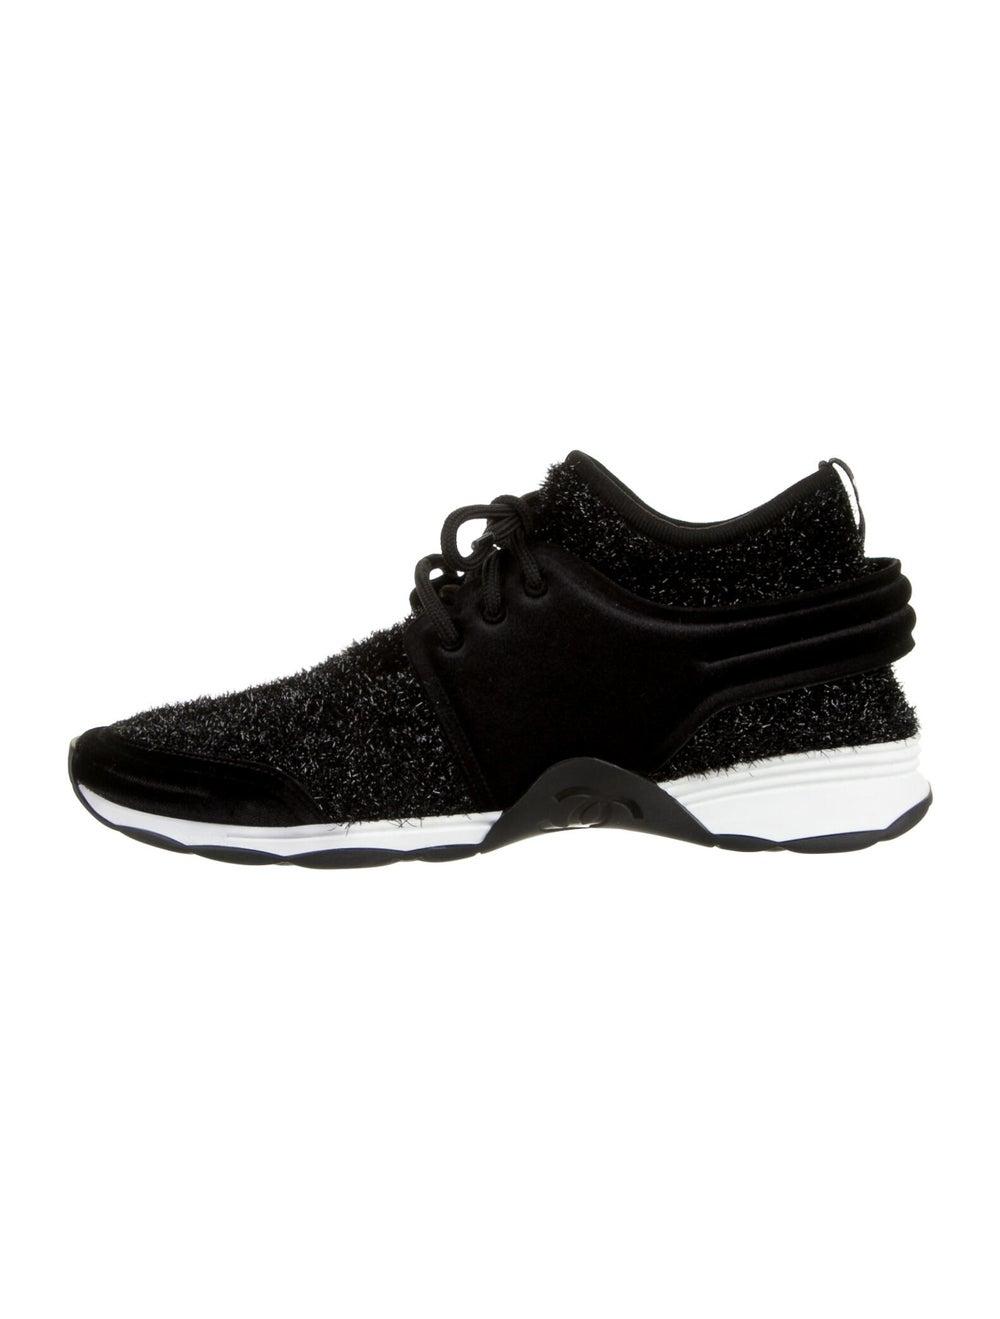 Chanel Tinsel Sock Sneakers Sneakers Black - image 1